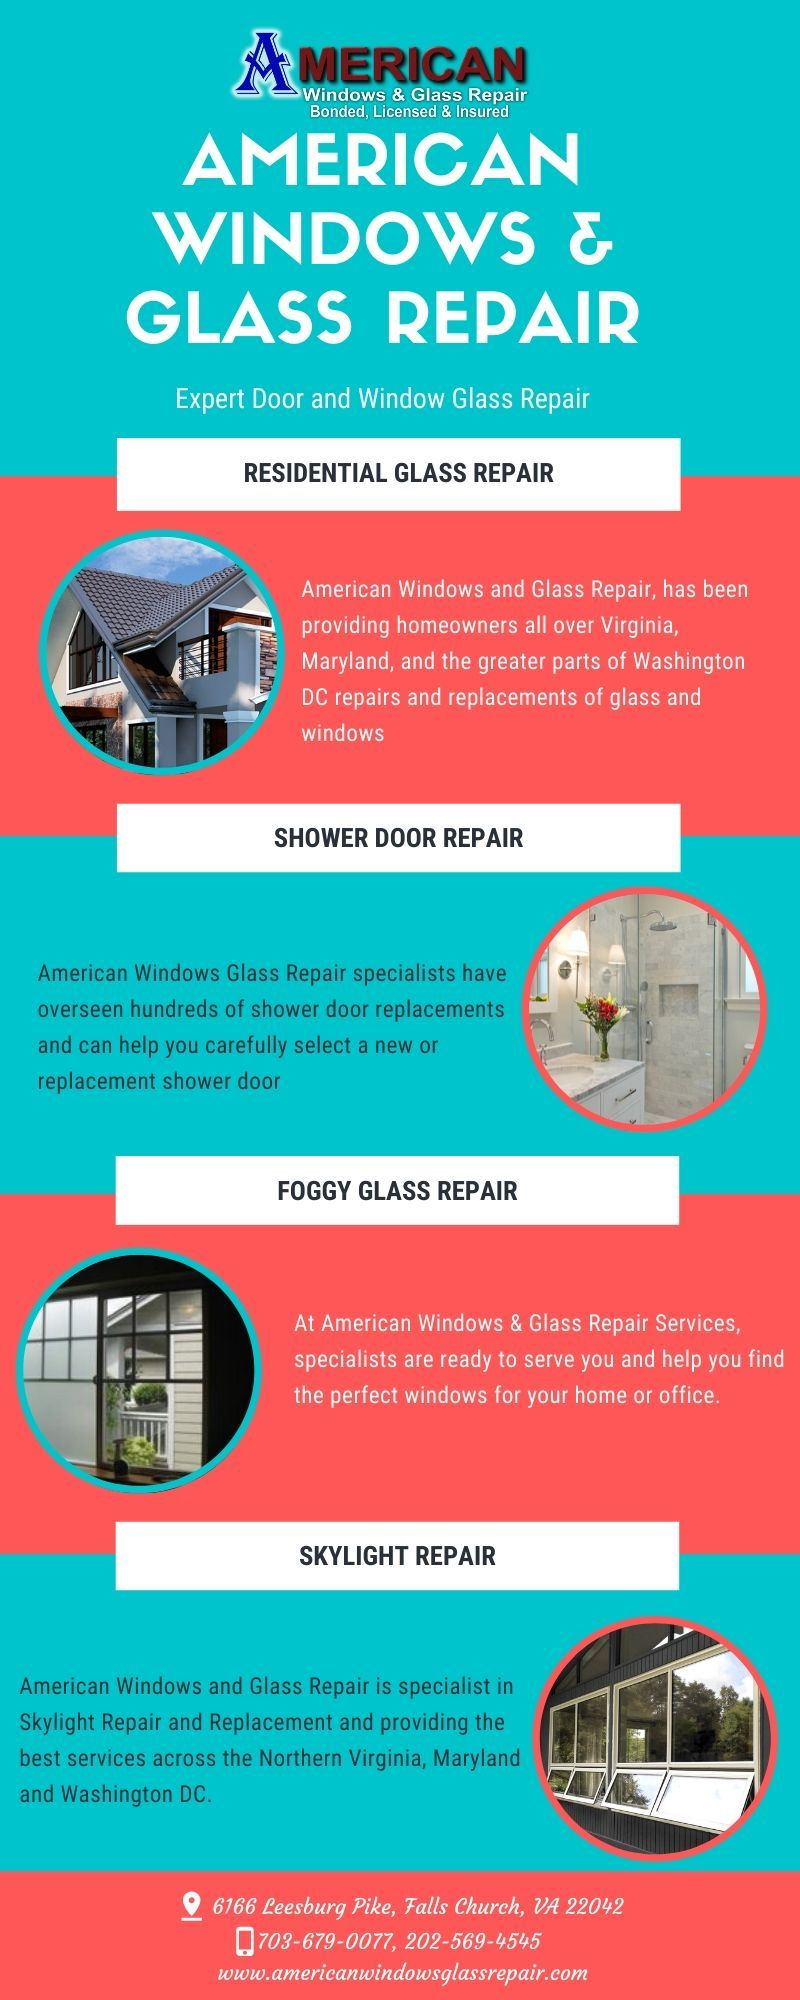 Door And Windows Residential Glass Repair Administration At Sterling Va In 2020 Glass Repair Window Glass Repair Door Repair